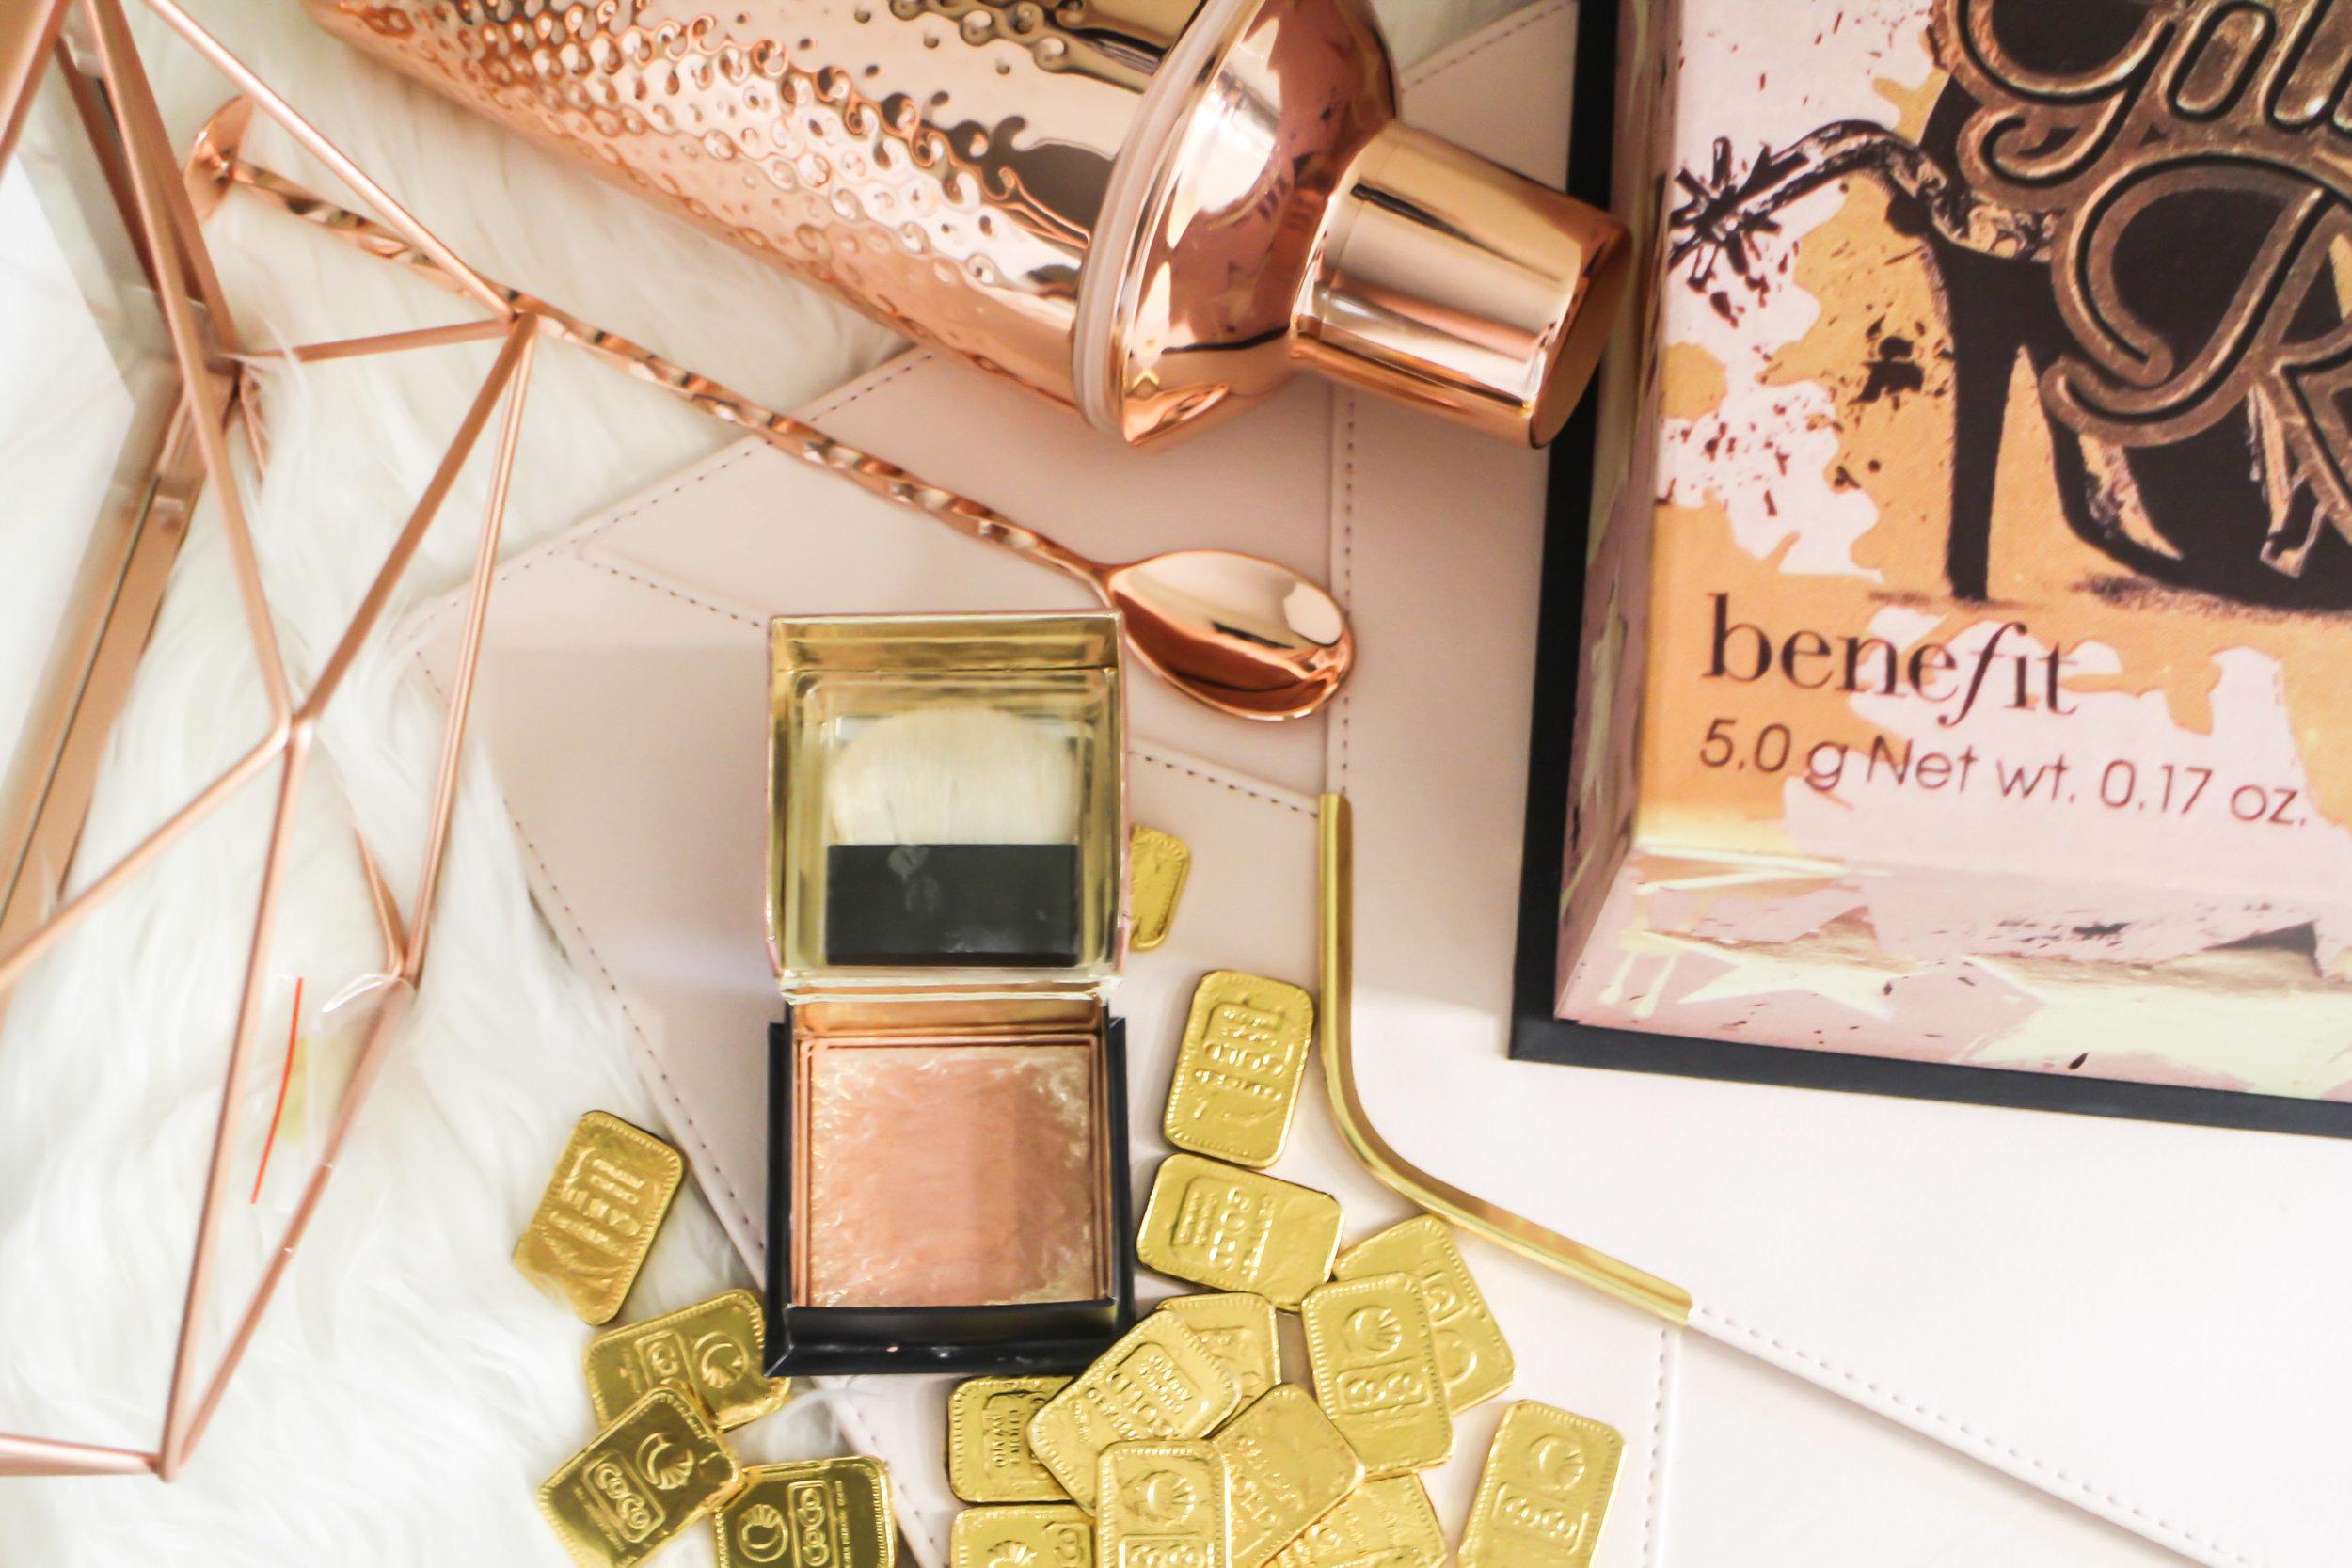 Benefit Gold Rush Blush